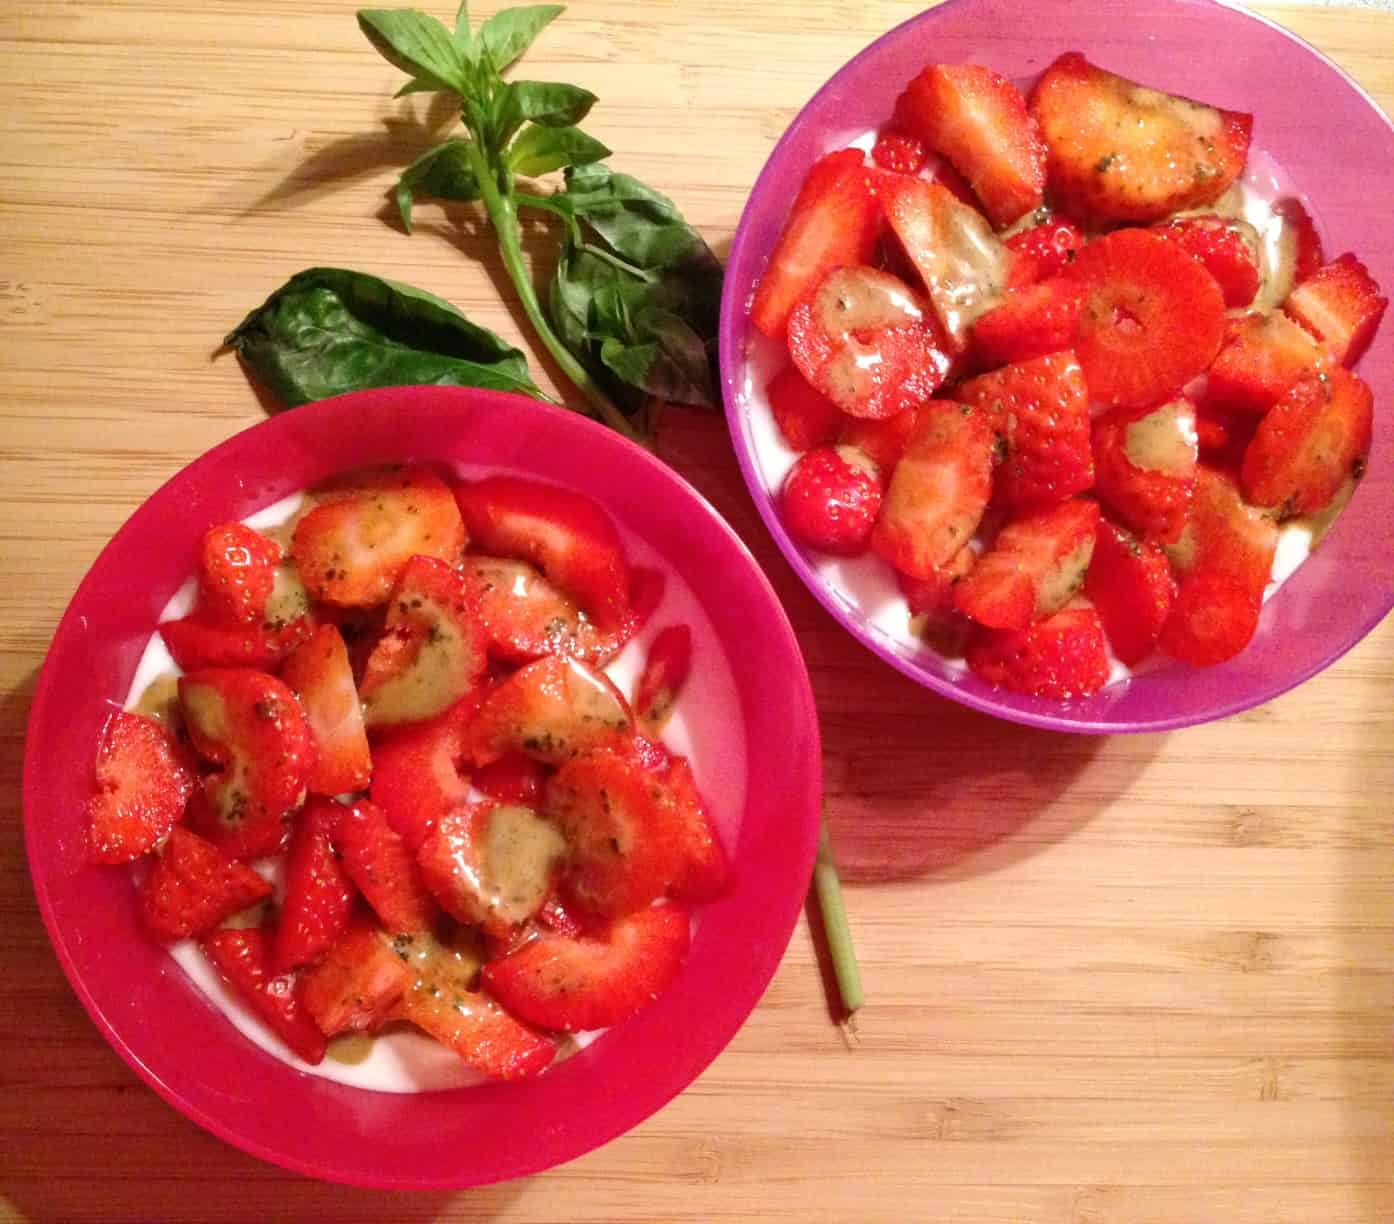 Aardbeien met yoghurt en basilicum balsamico